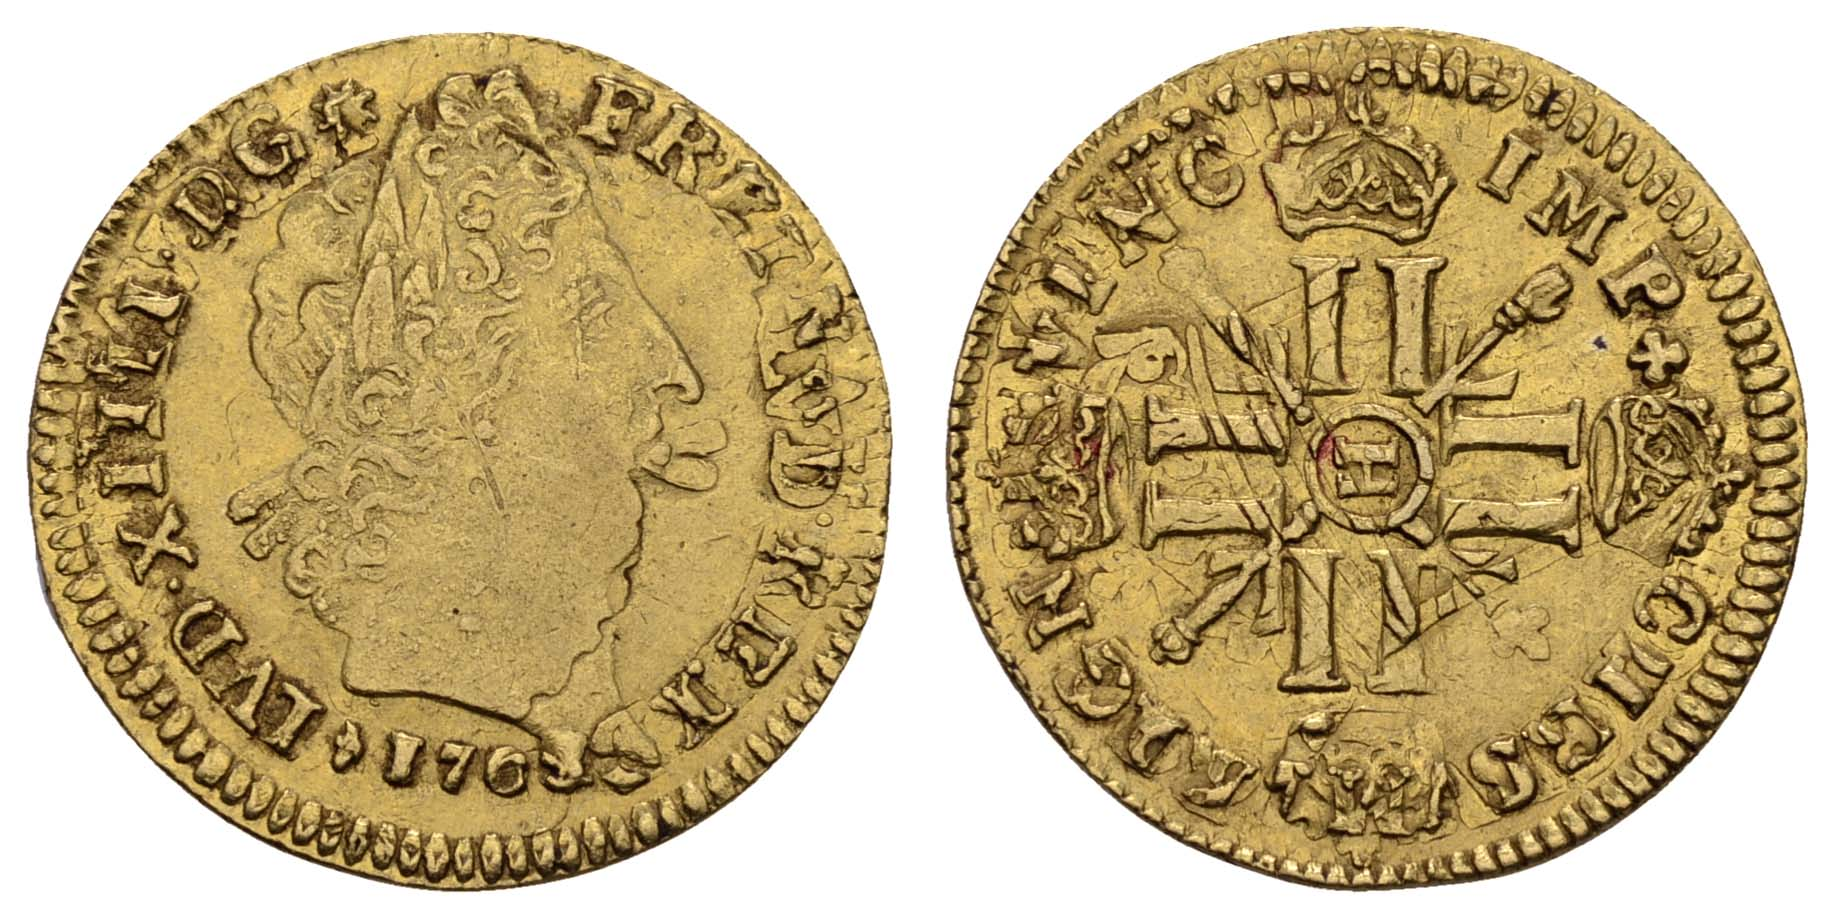 Lot 1296 - europa bis 1799 - Frankreich -  Auktionshaus Ulrich Felzmann GmbH & Co. KG Coins single lots